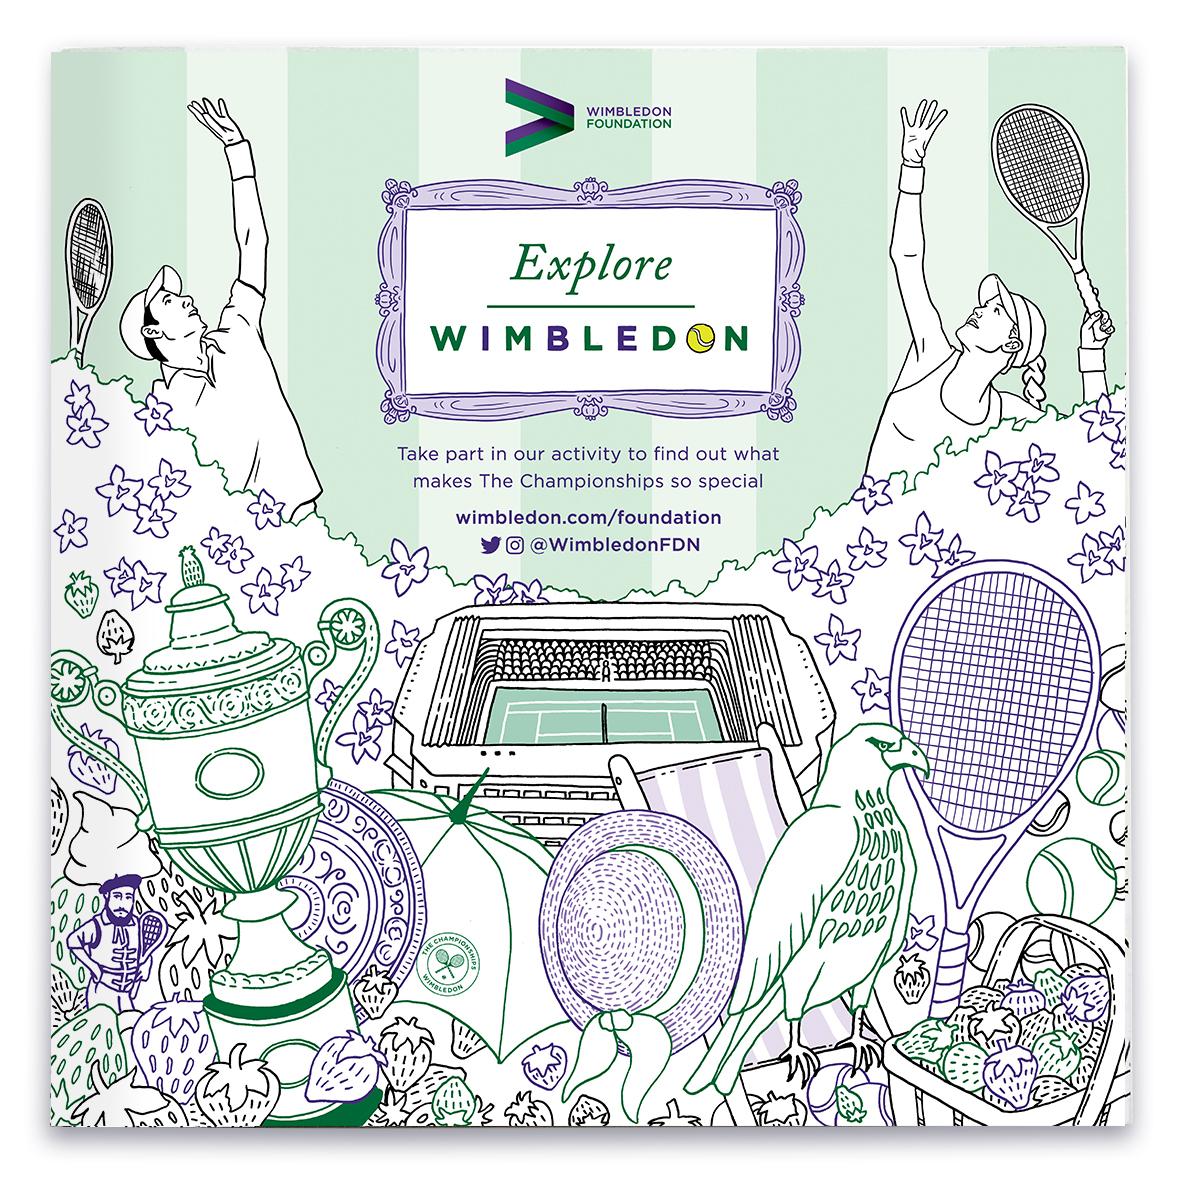 Explore Wimbledon